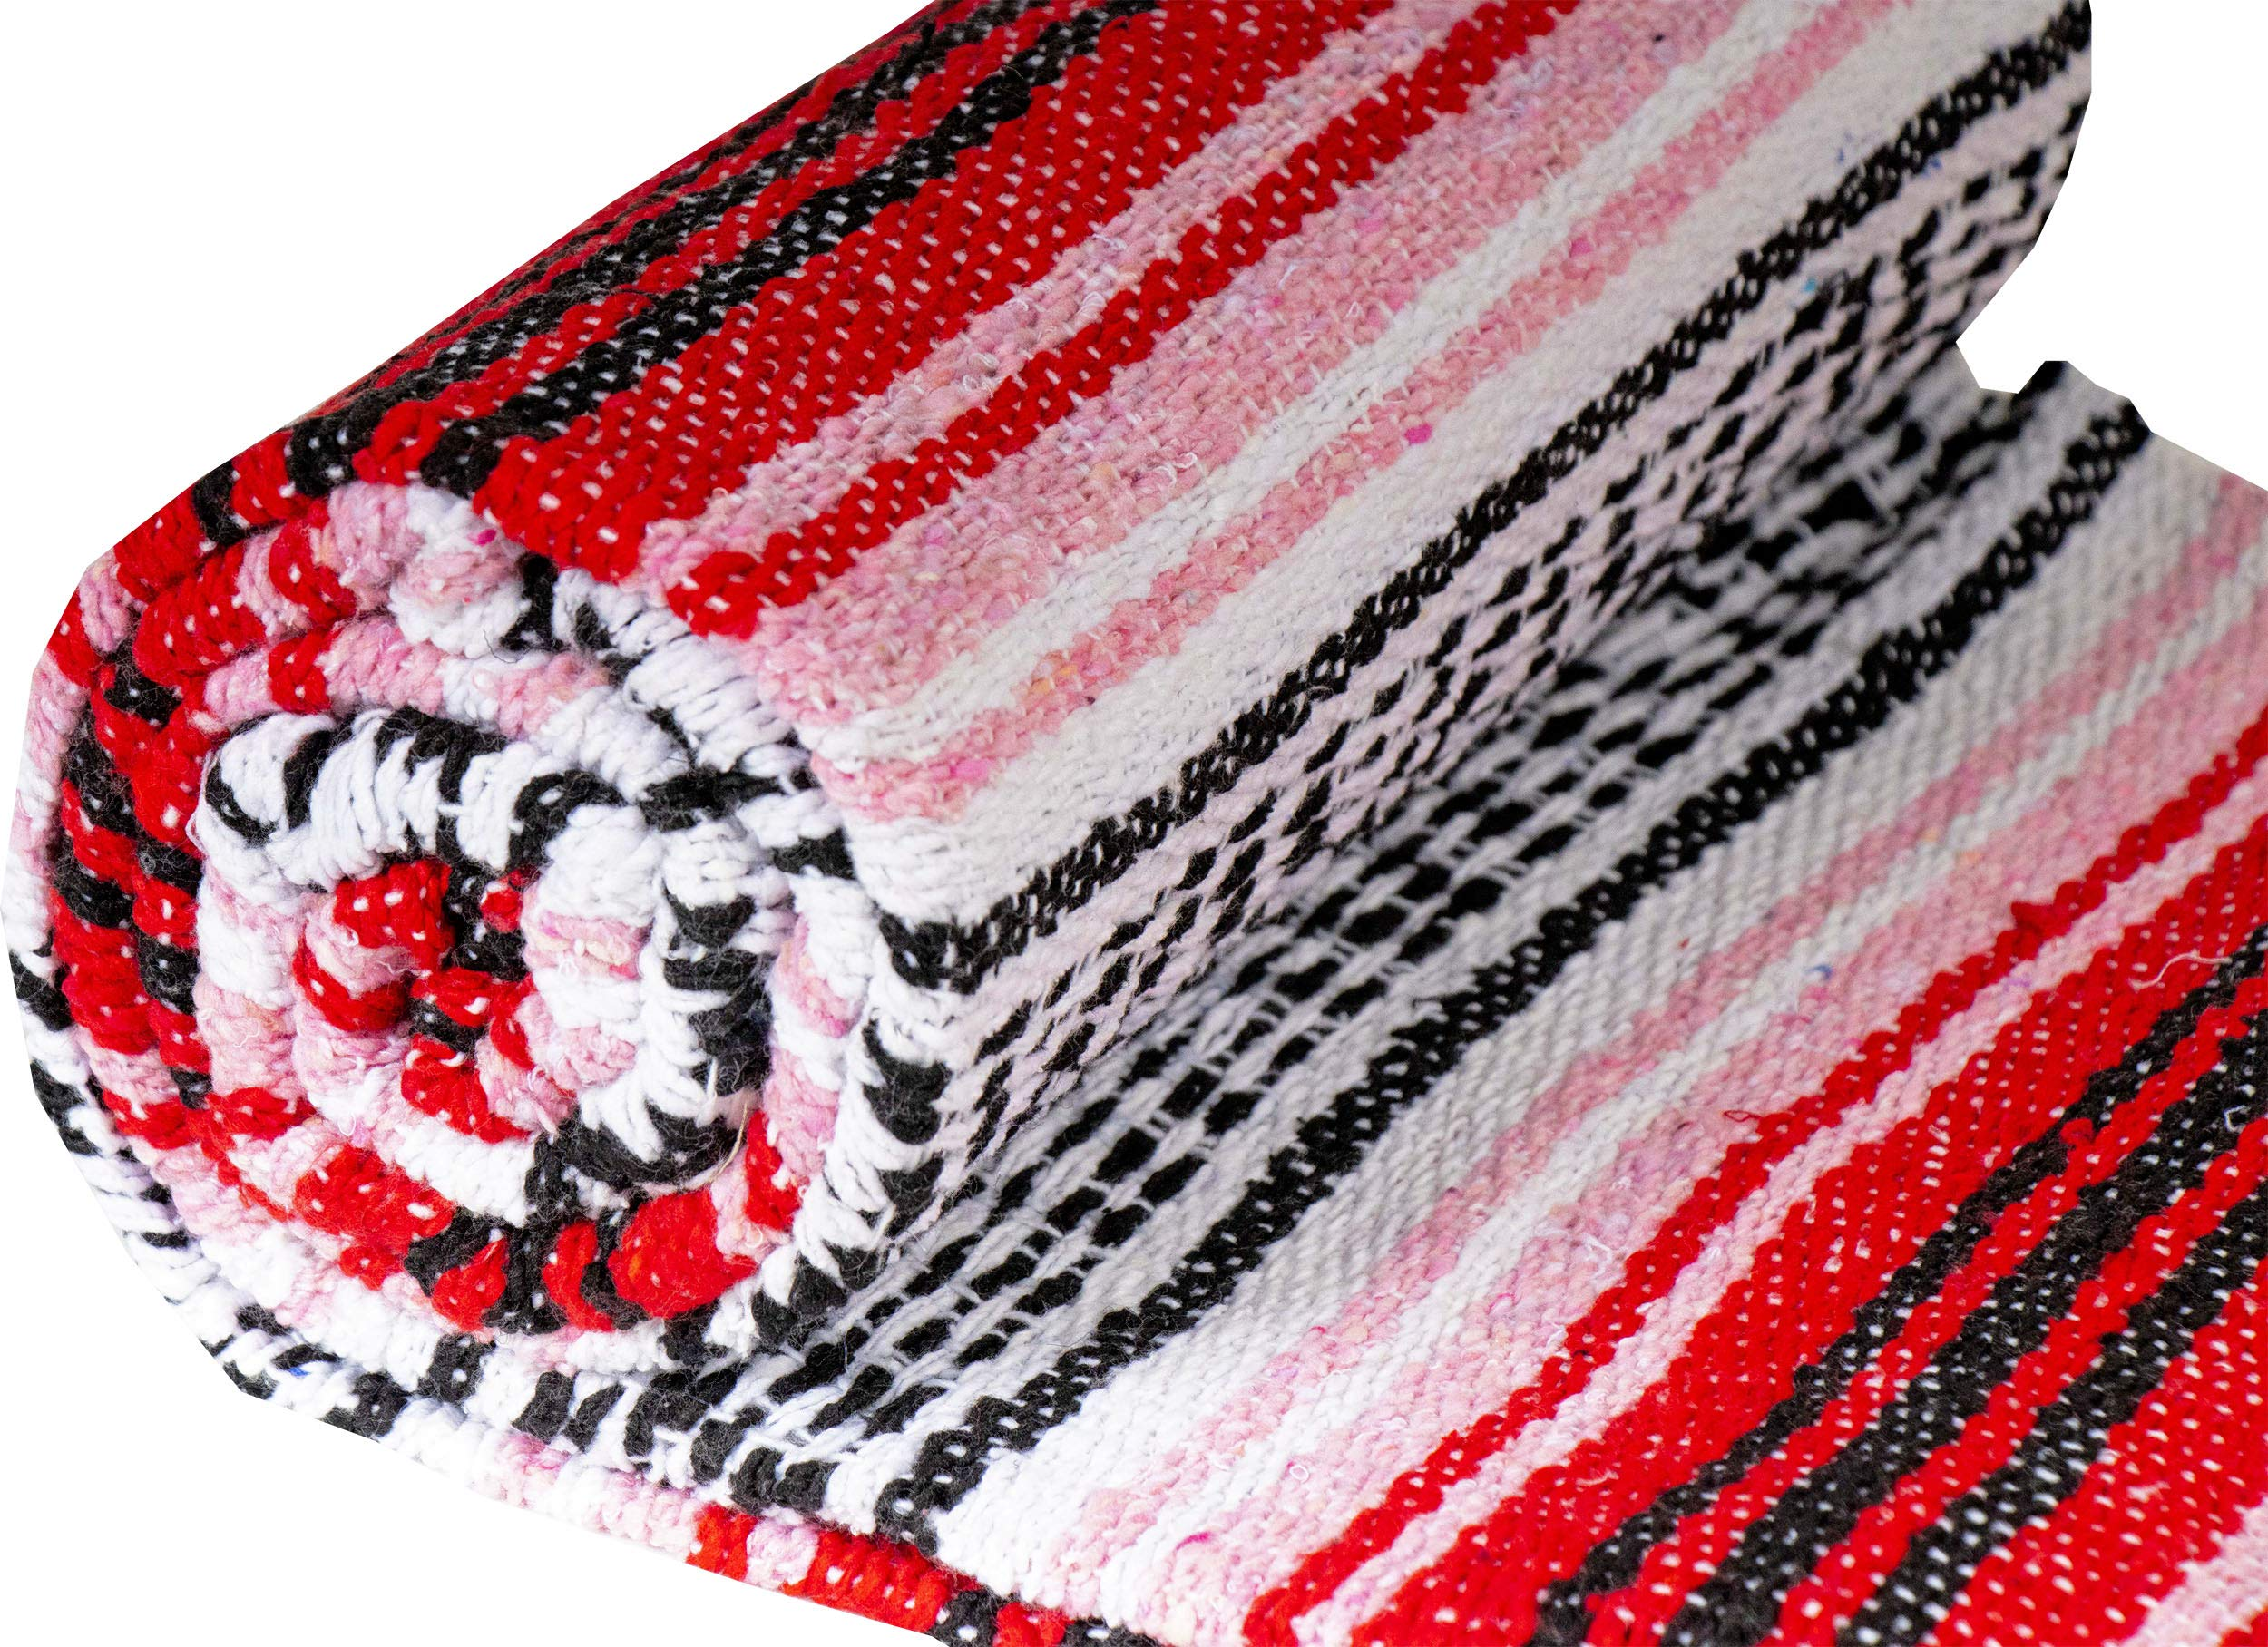 El Paso Designs Genuine Mexican Falsa Blanket - Yoga Studio Blanket, Colorful, Soft Woven Serape Imported from Mexico (Cherry) by El Paso Designs (Image #4)